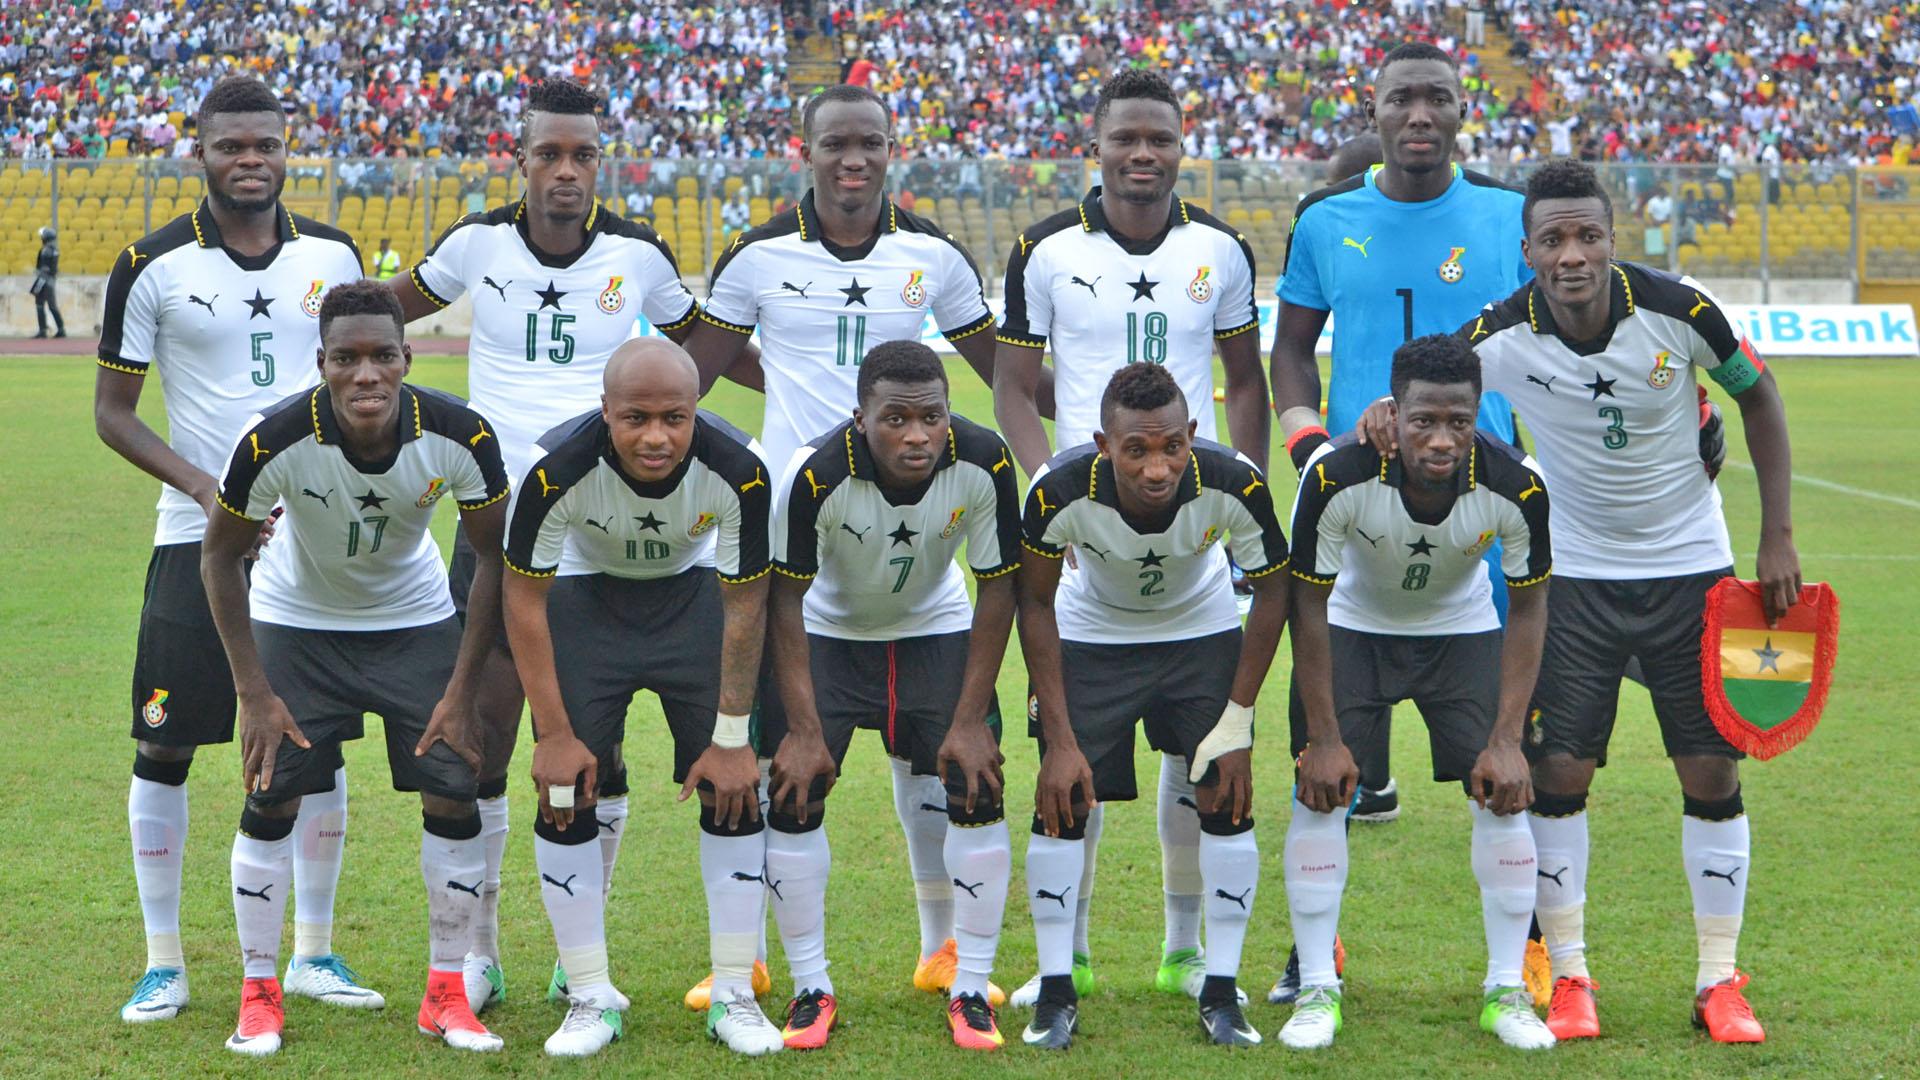 Five debutantes named in Ghana squad to play Kenya, Wimbledon striker Appiah among several returnees